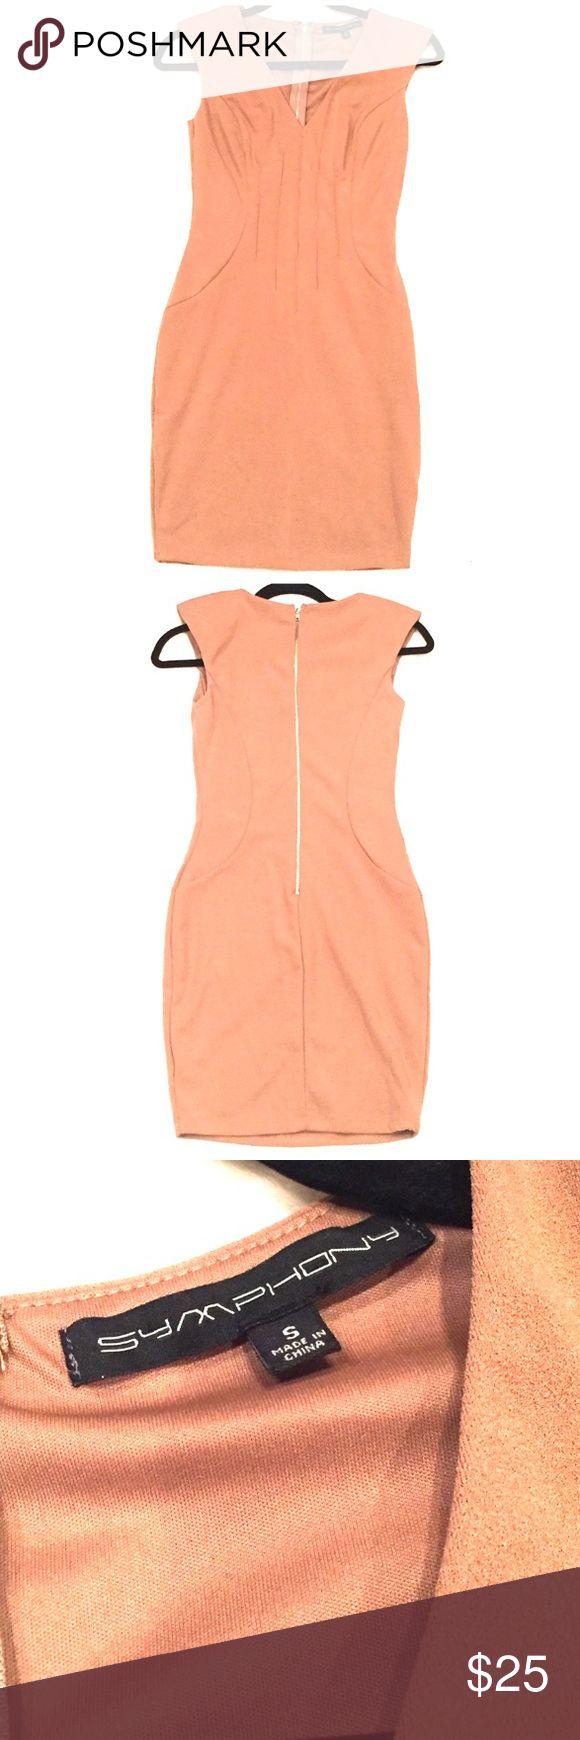 Dress Camel Body Con Dress •Size Small •Zipper along the back •95% polyester, 5% spandex  •Shoulder pad Only worn once👗🐪👠 Symphony Dresses Midi